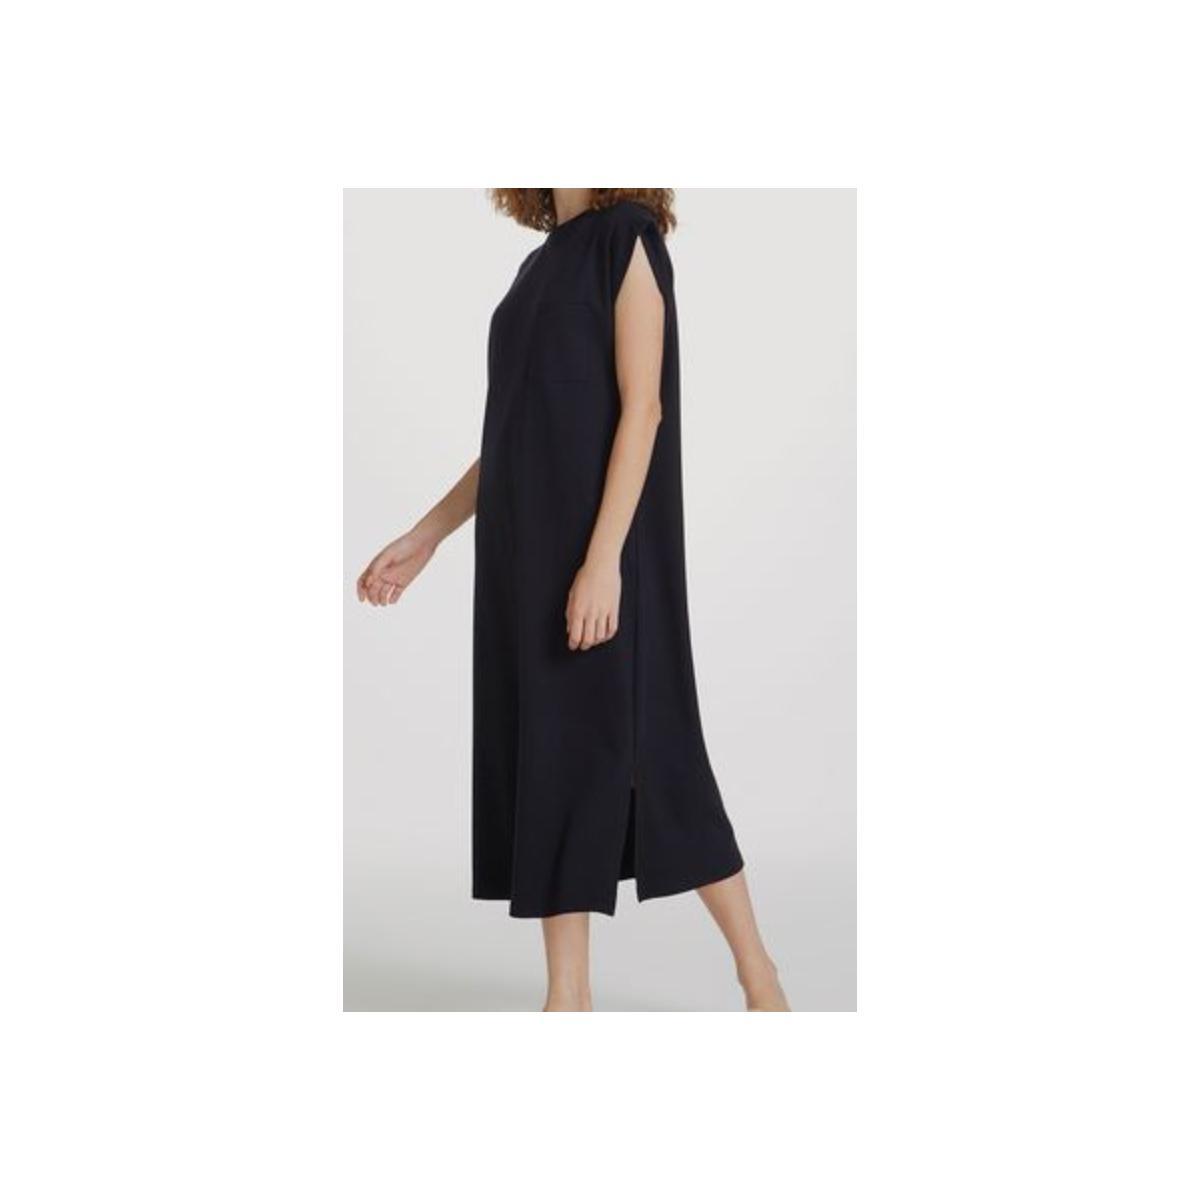 Vestido Feminino Hering 0b67 N10en Preto